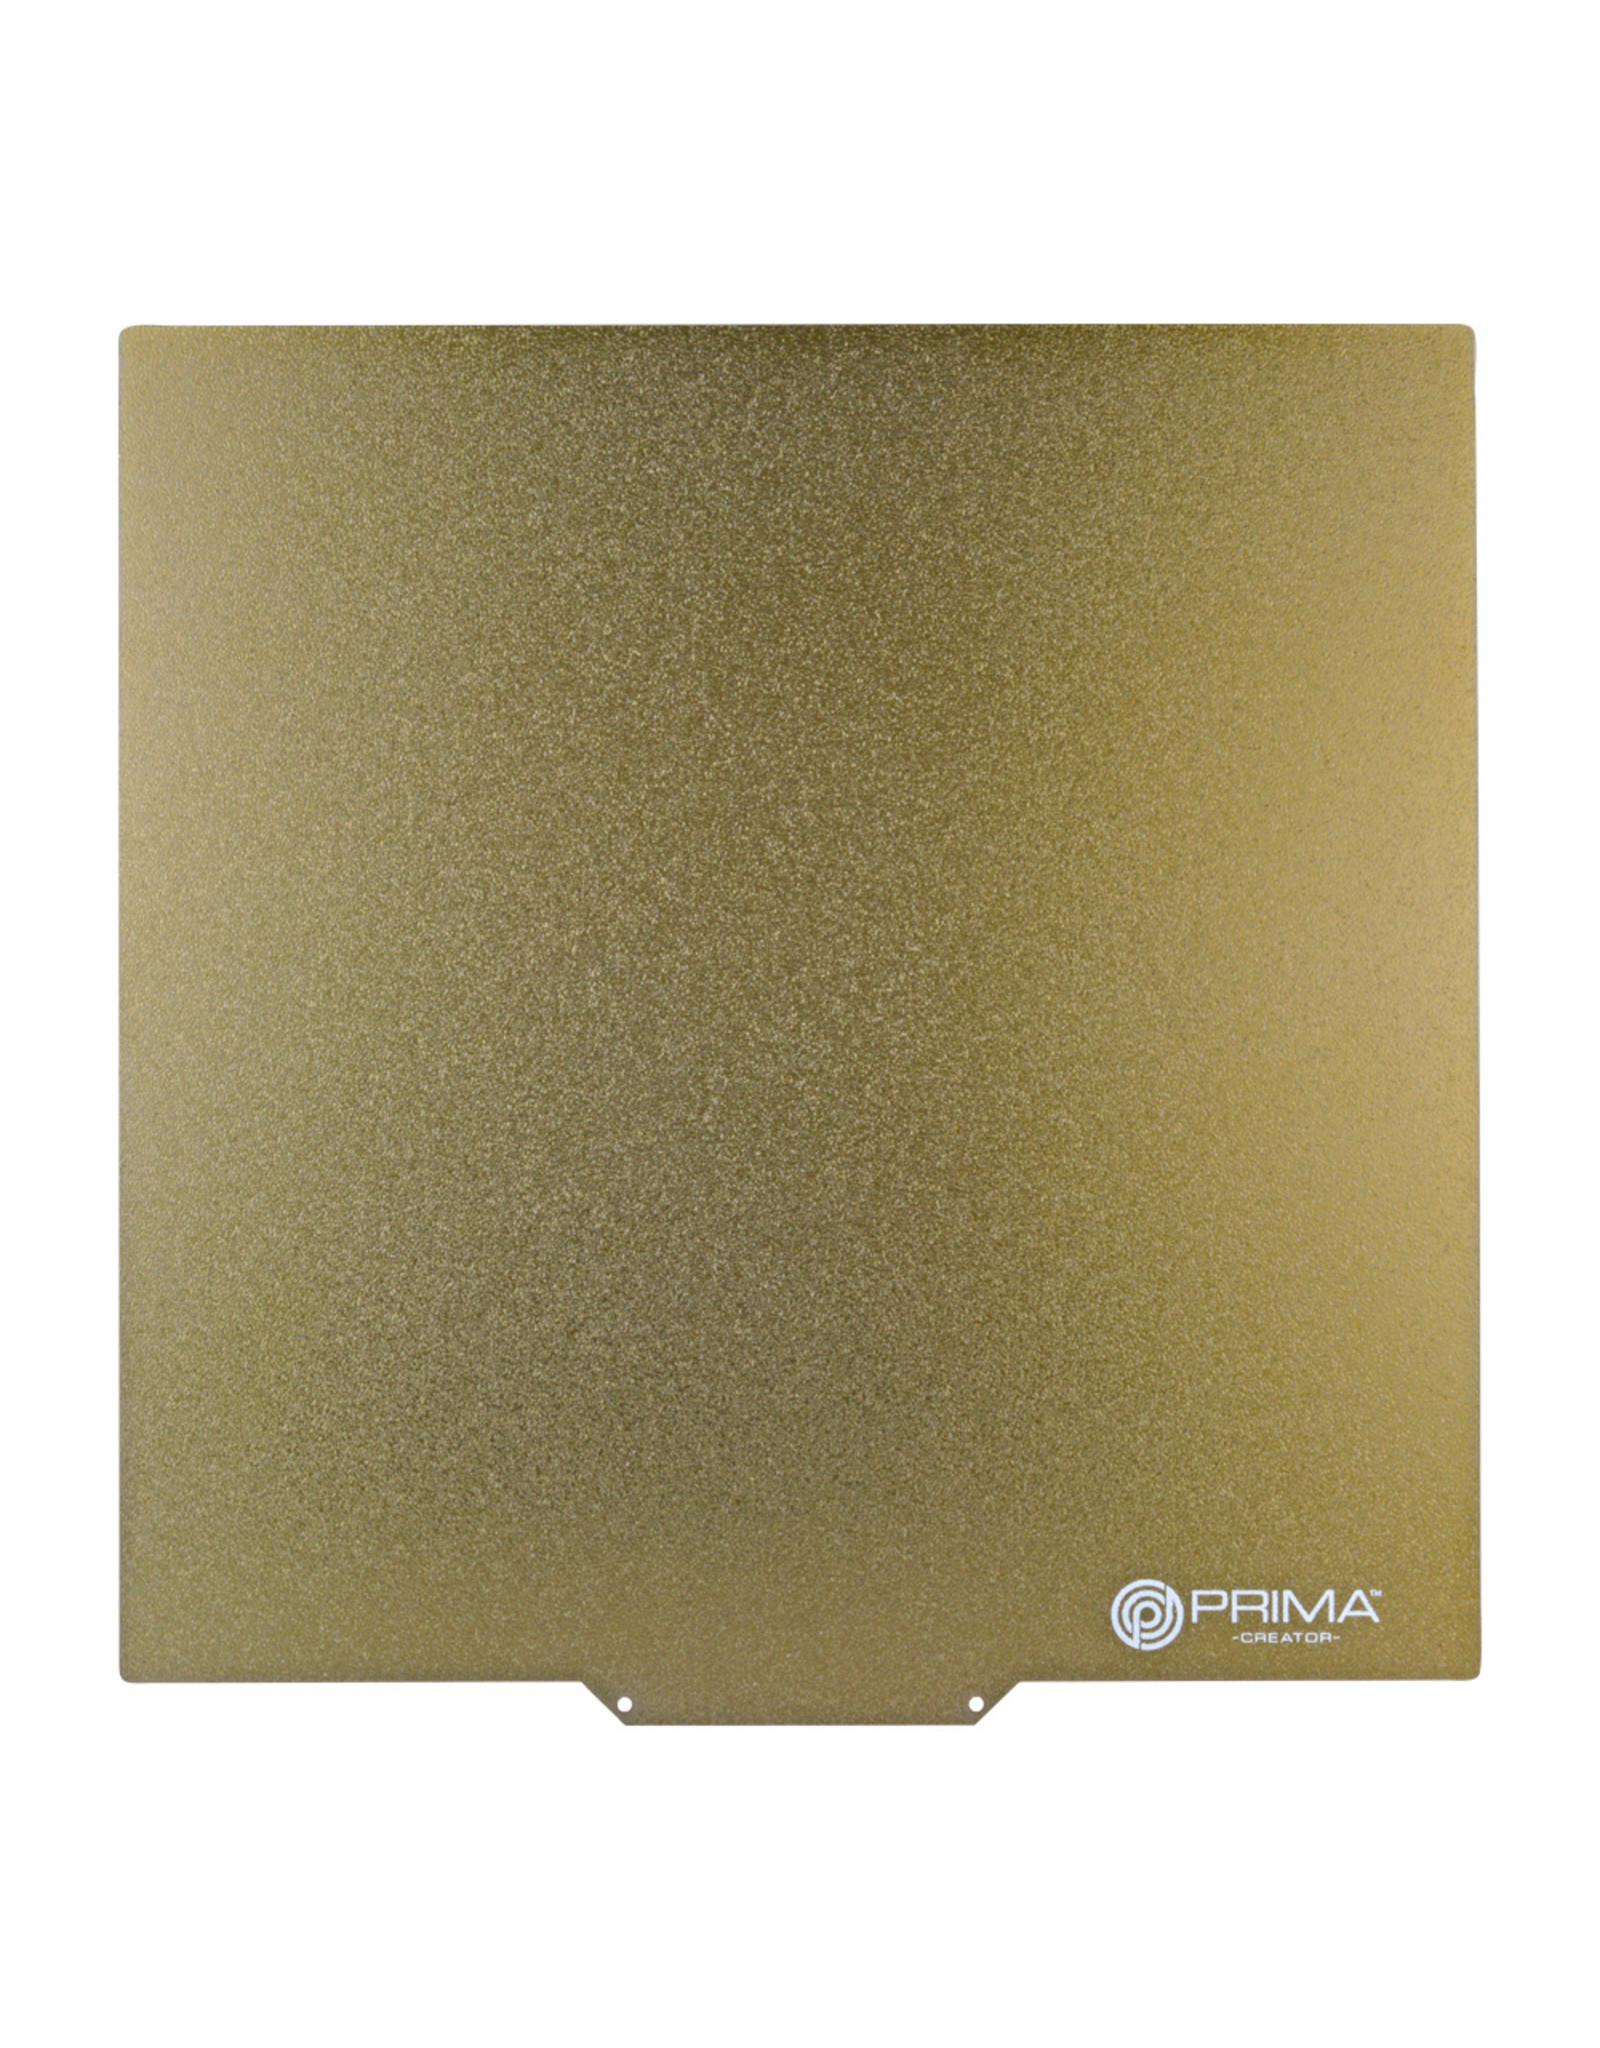 Prima PrimaCreator FlexPlate-Powder Coated PEI different sizes